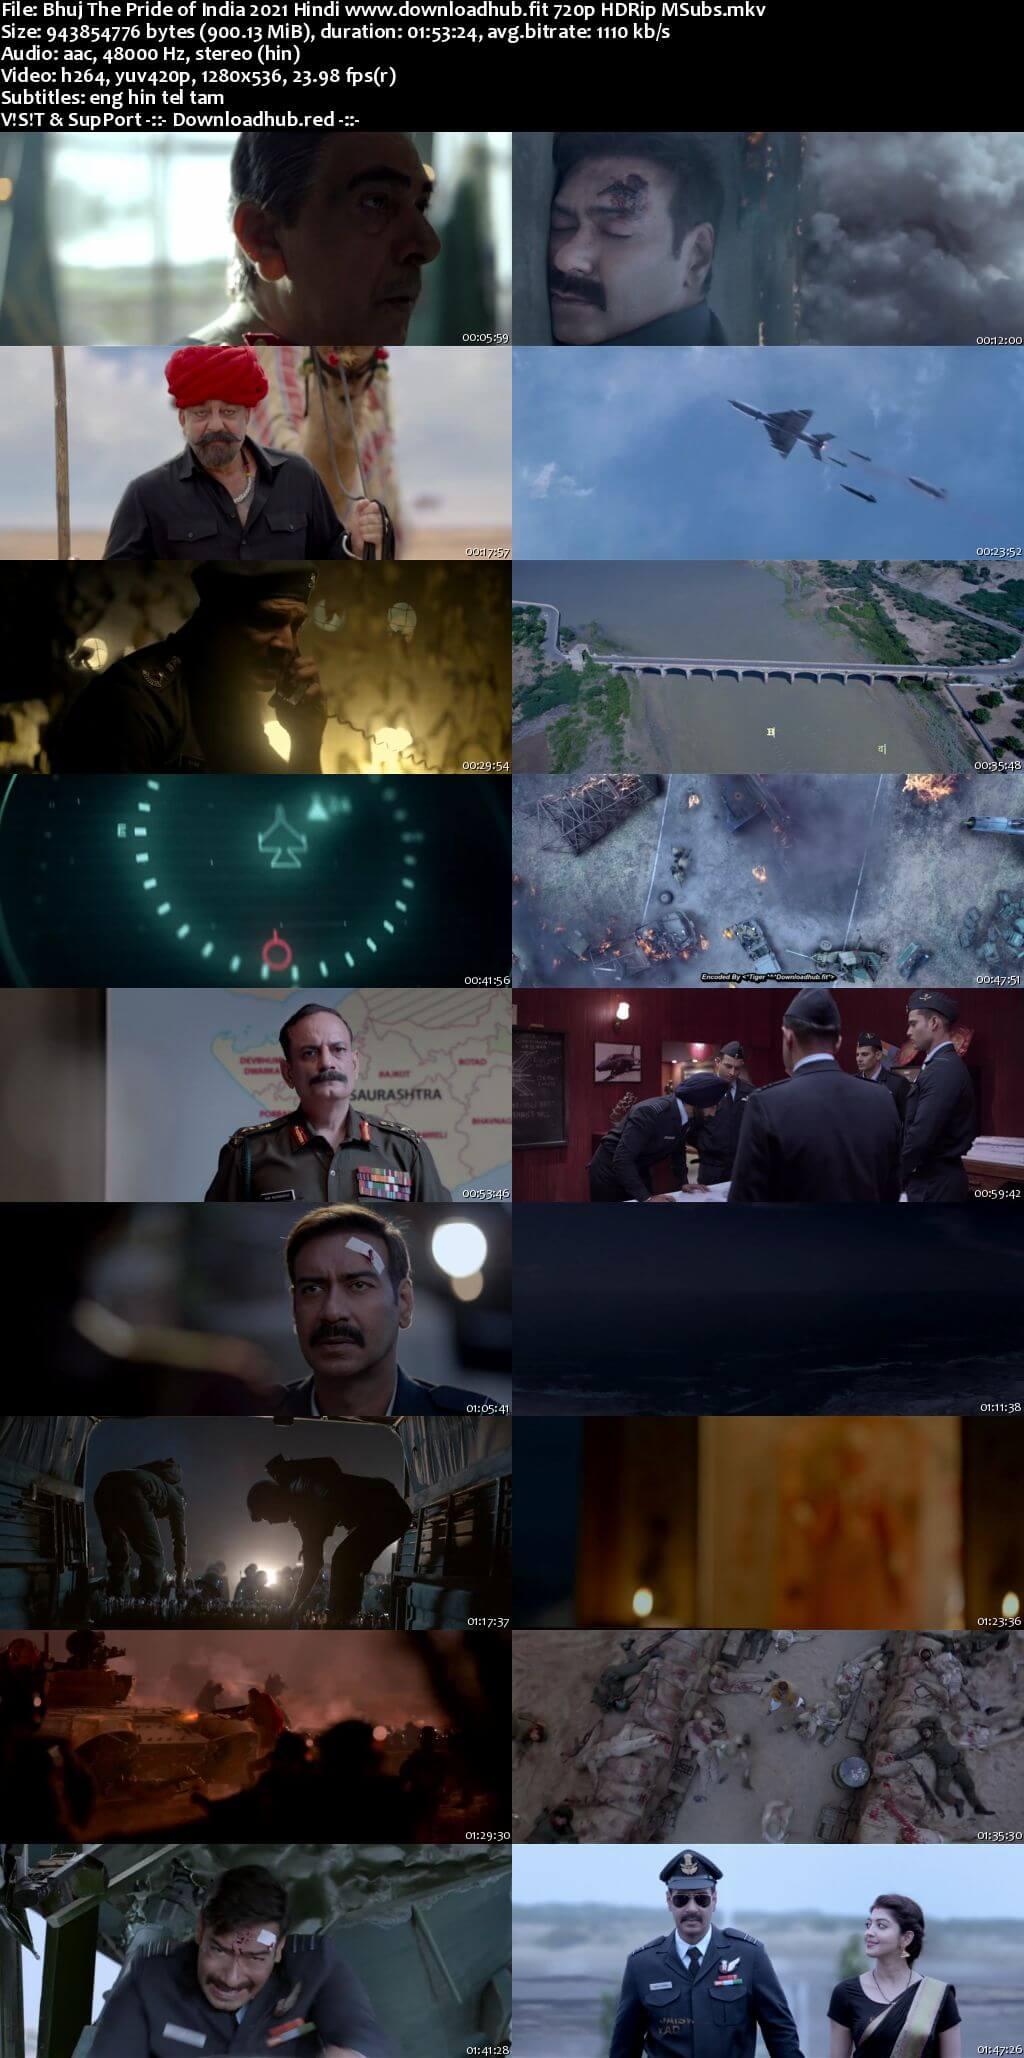 Bhuj The Pride of India 2021 Hindi 720p HDRip MSubs